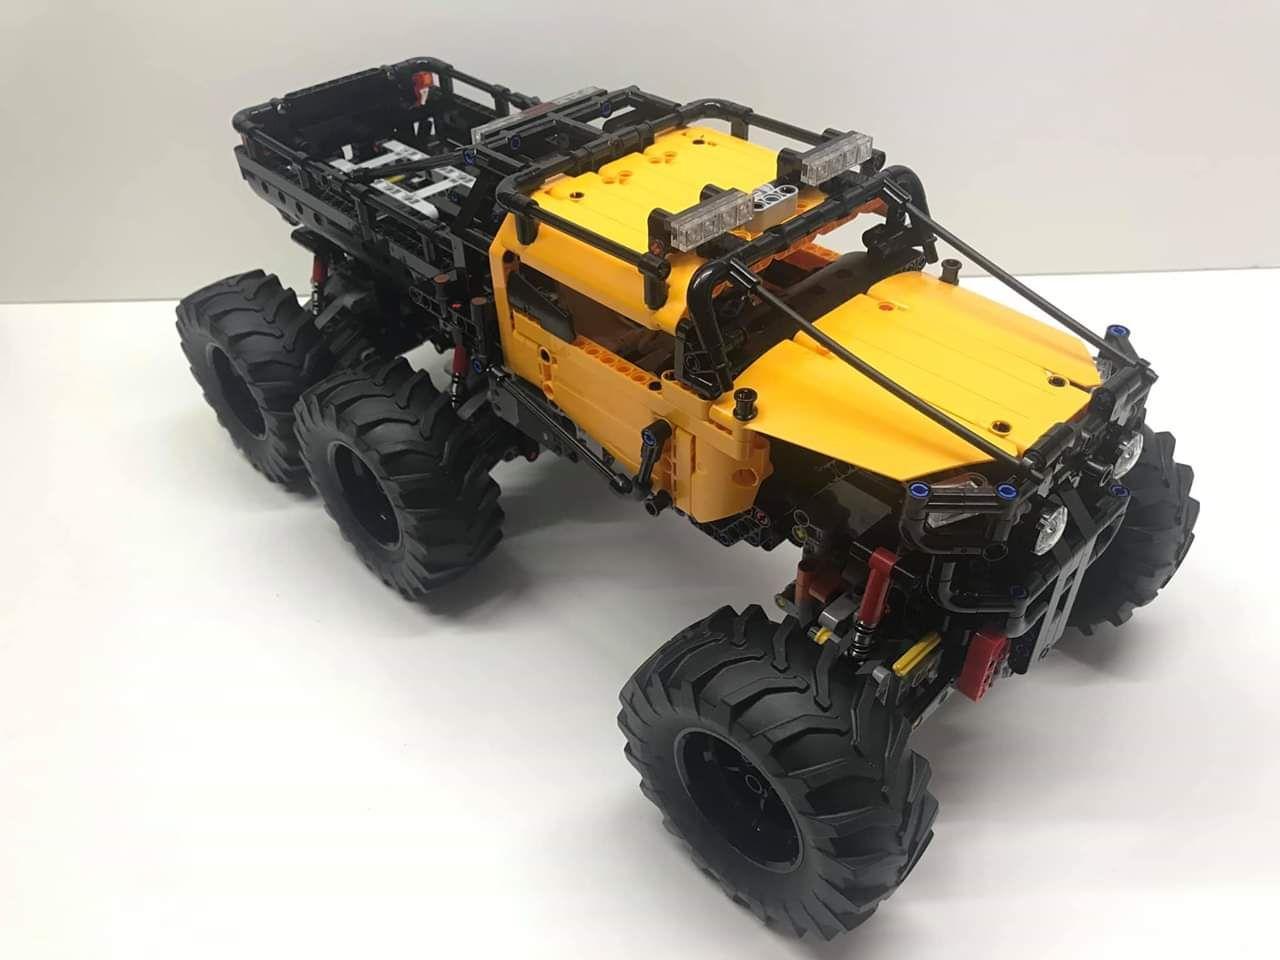 Lego Technic 42099 Moc 6x6 X Treme Off Roader Lego Technic Lego Technic Truck Lego